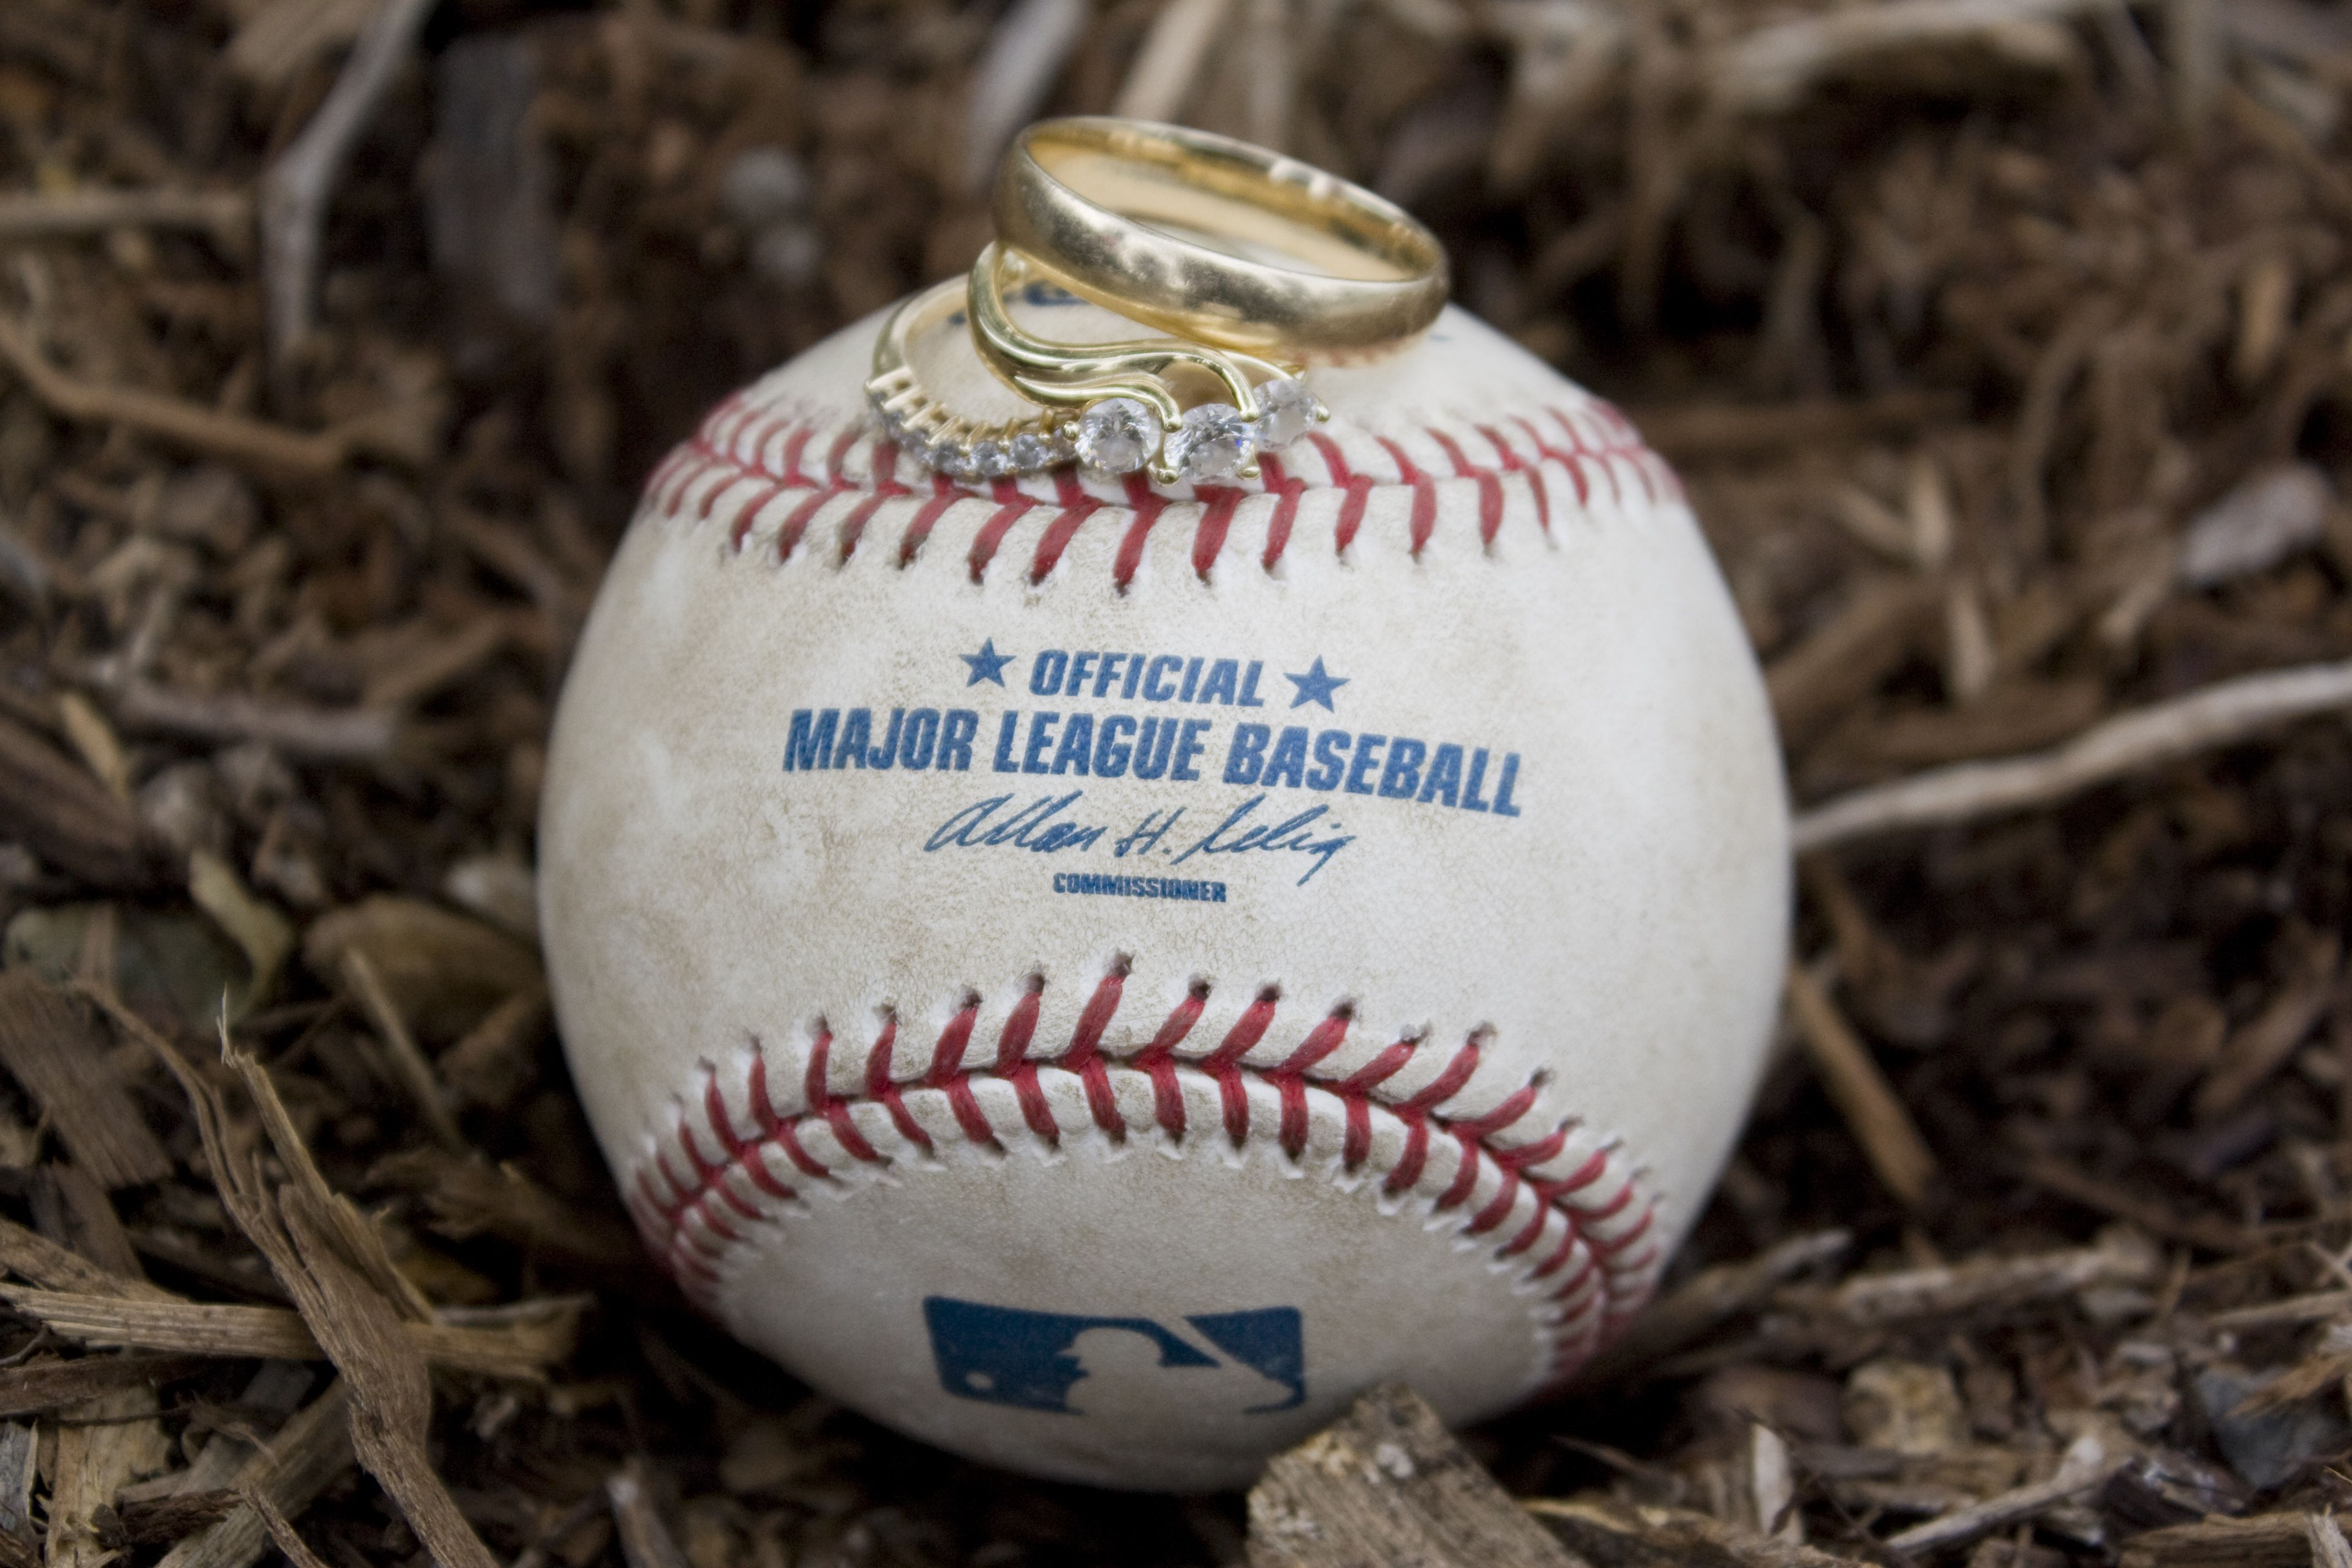 Official MLB Baseball With Wedding Rings Weddings On Weddings On We